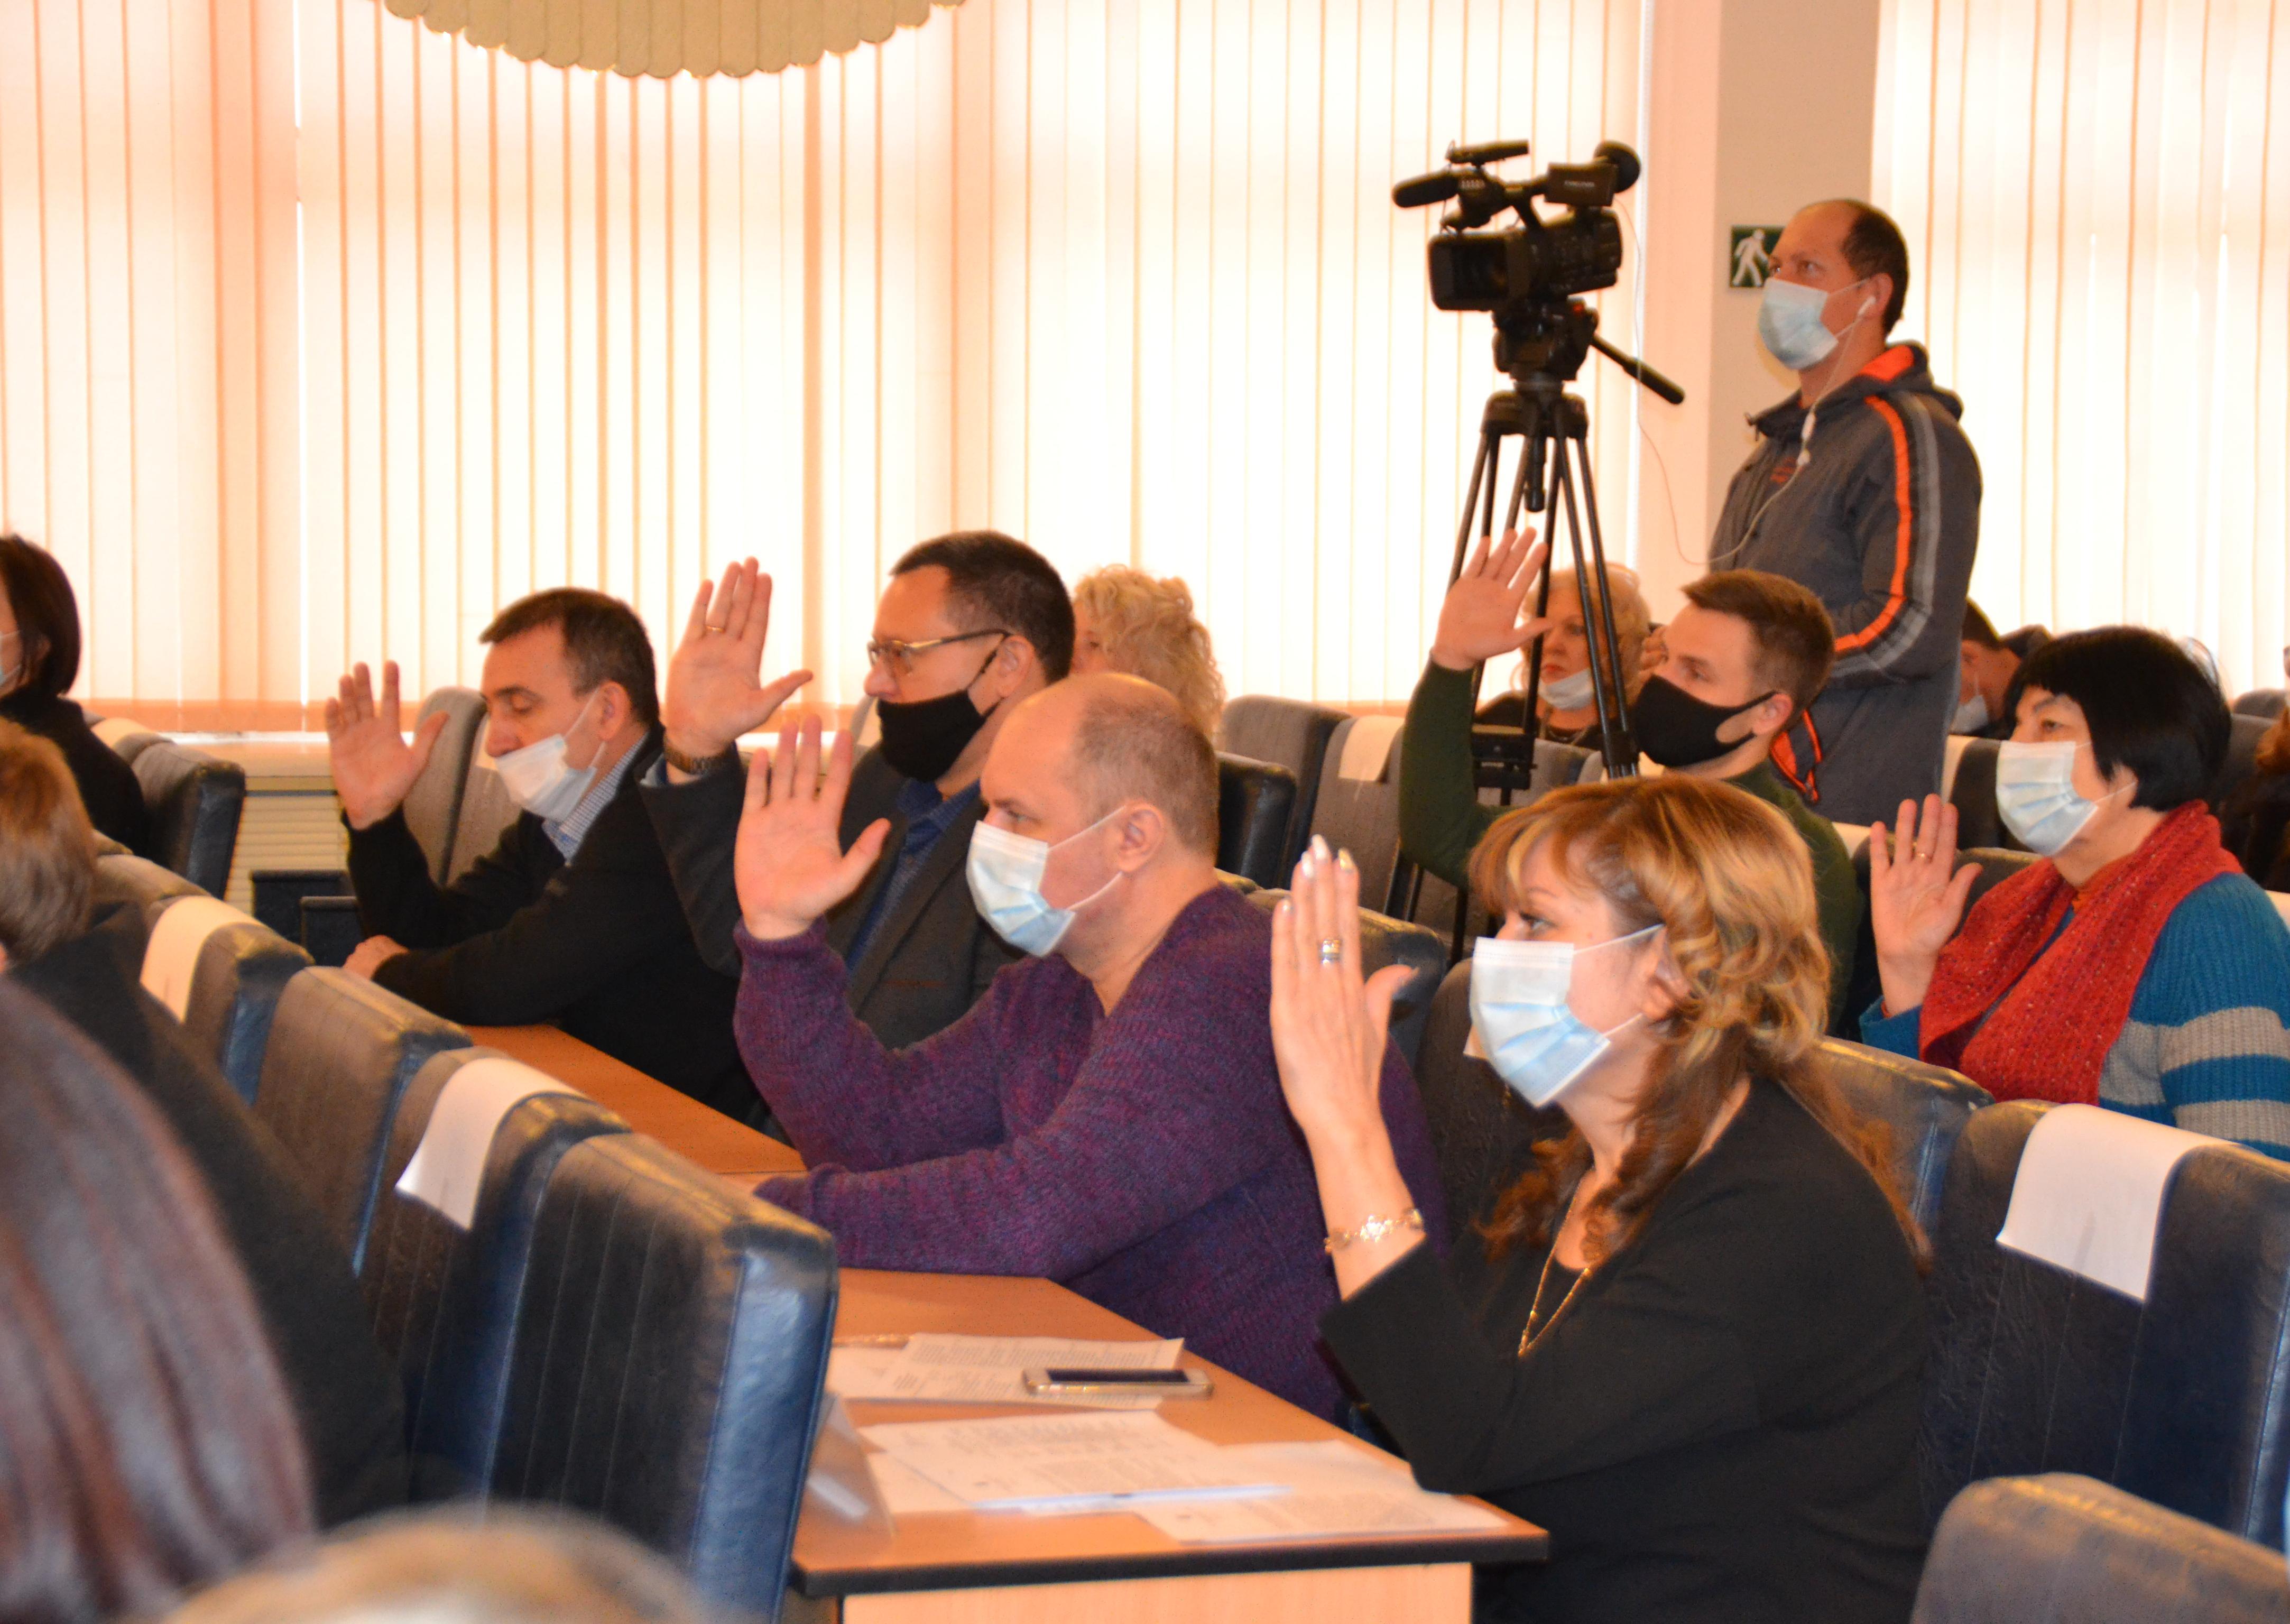 На заседании Совета рассмотрен отчет о работе главы и администрации города Туапсе за 2020 год